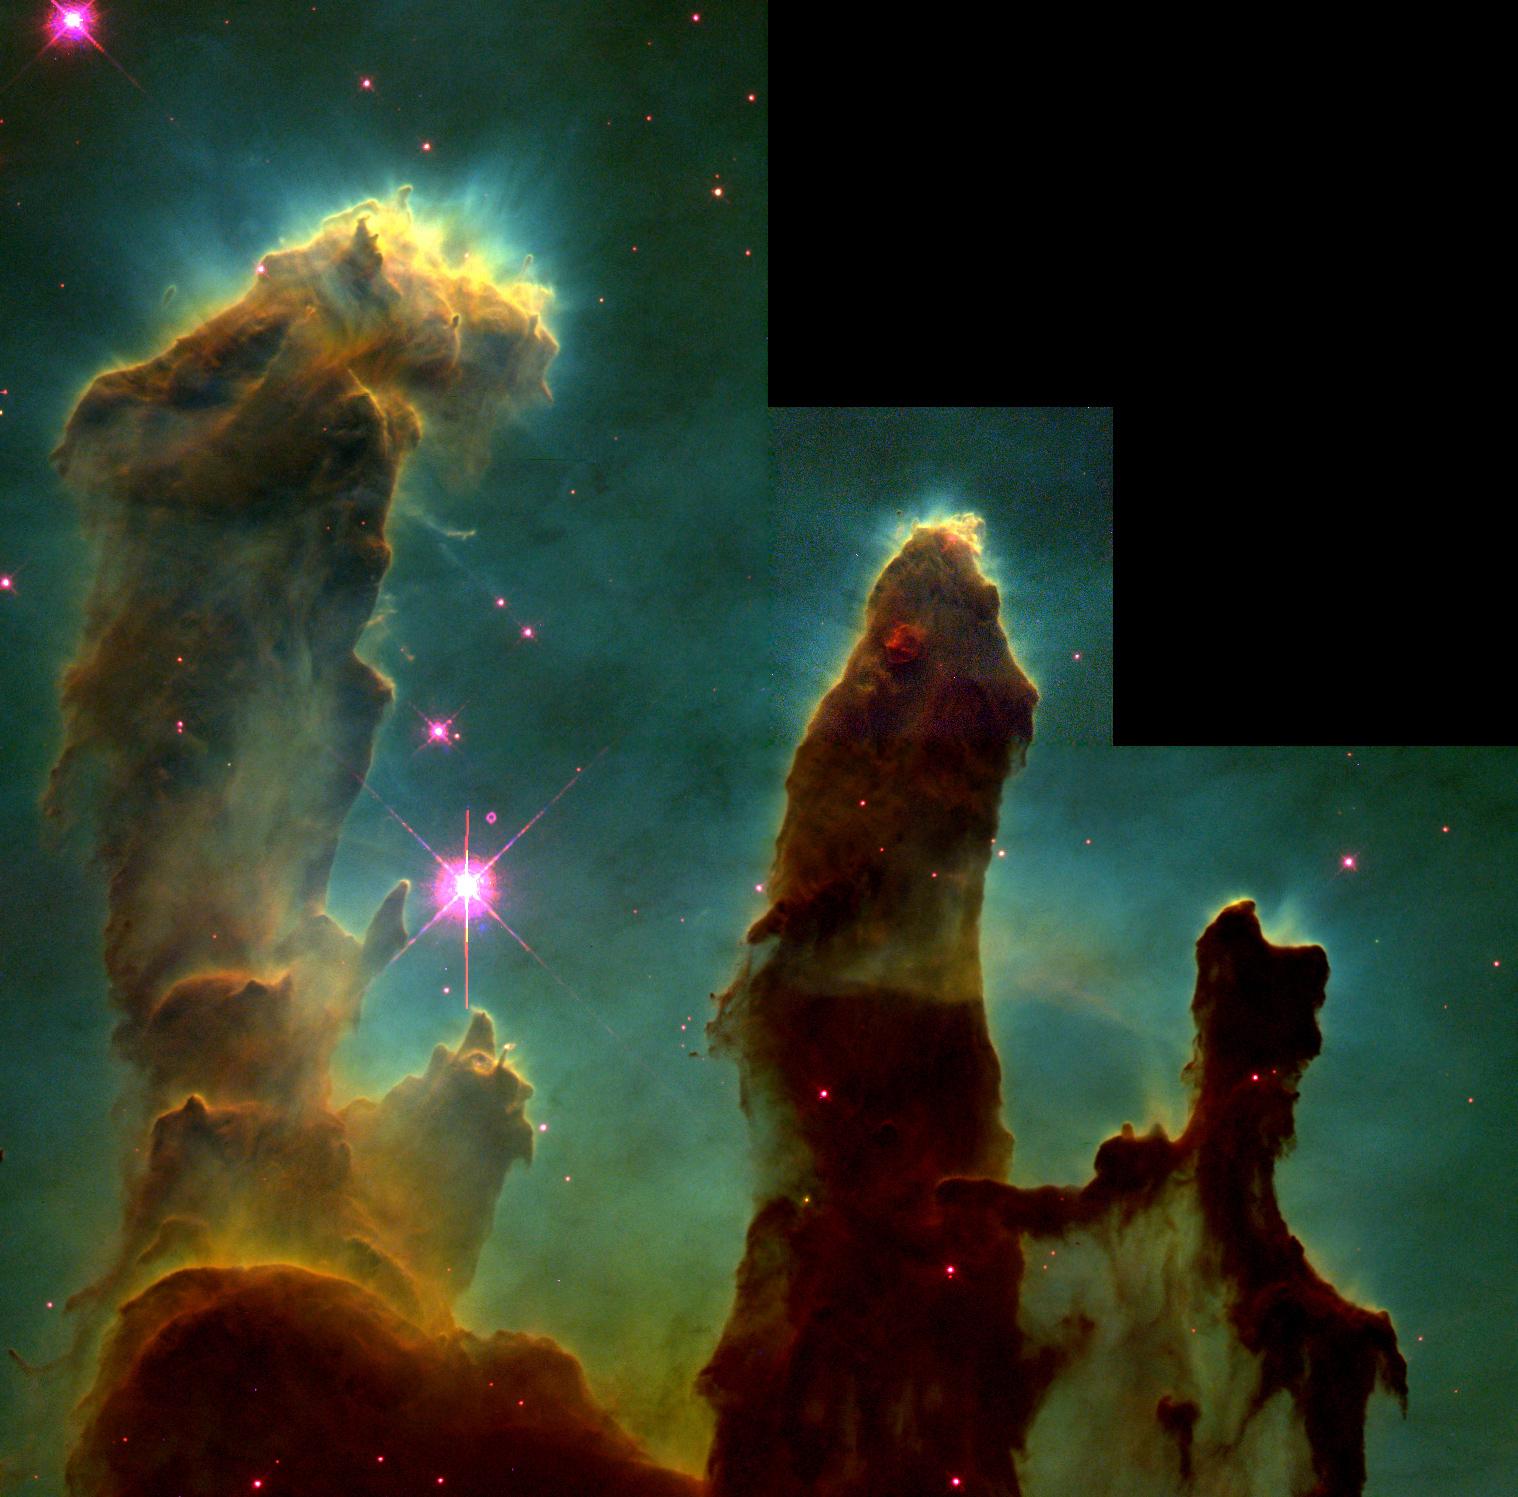 HUBBLE'S TOP 100 •#82 • Credit: Jeff Hester and Paul Scowen (Arizona State University), and NASA/ESA